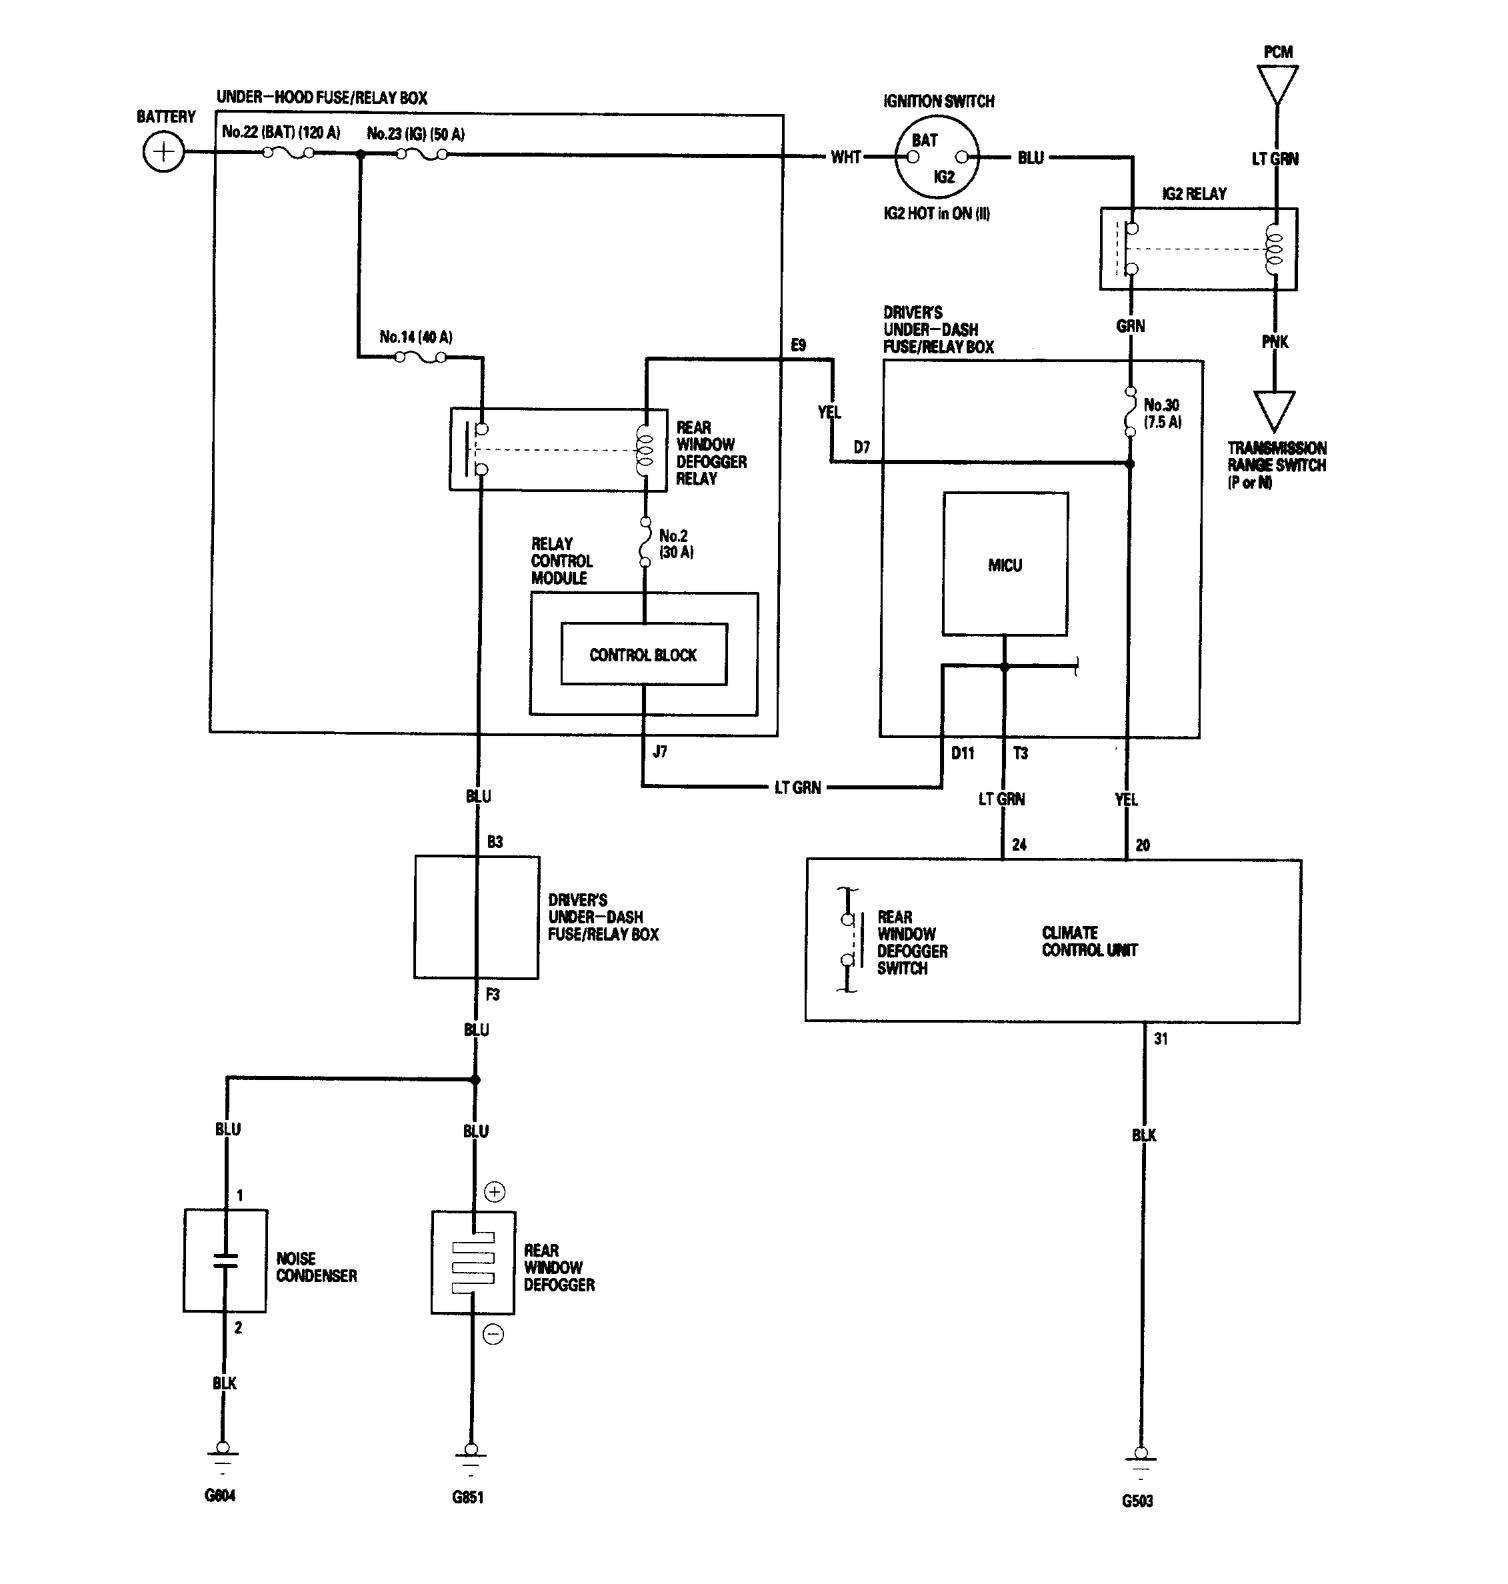 integra ecu wiring diagram free download wiring diagram schematic